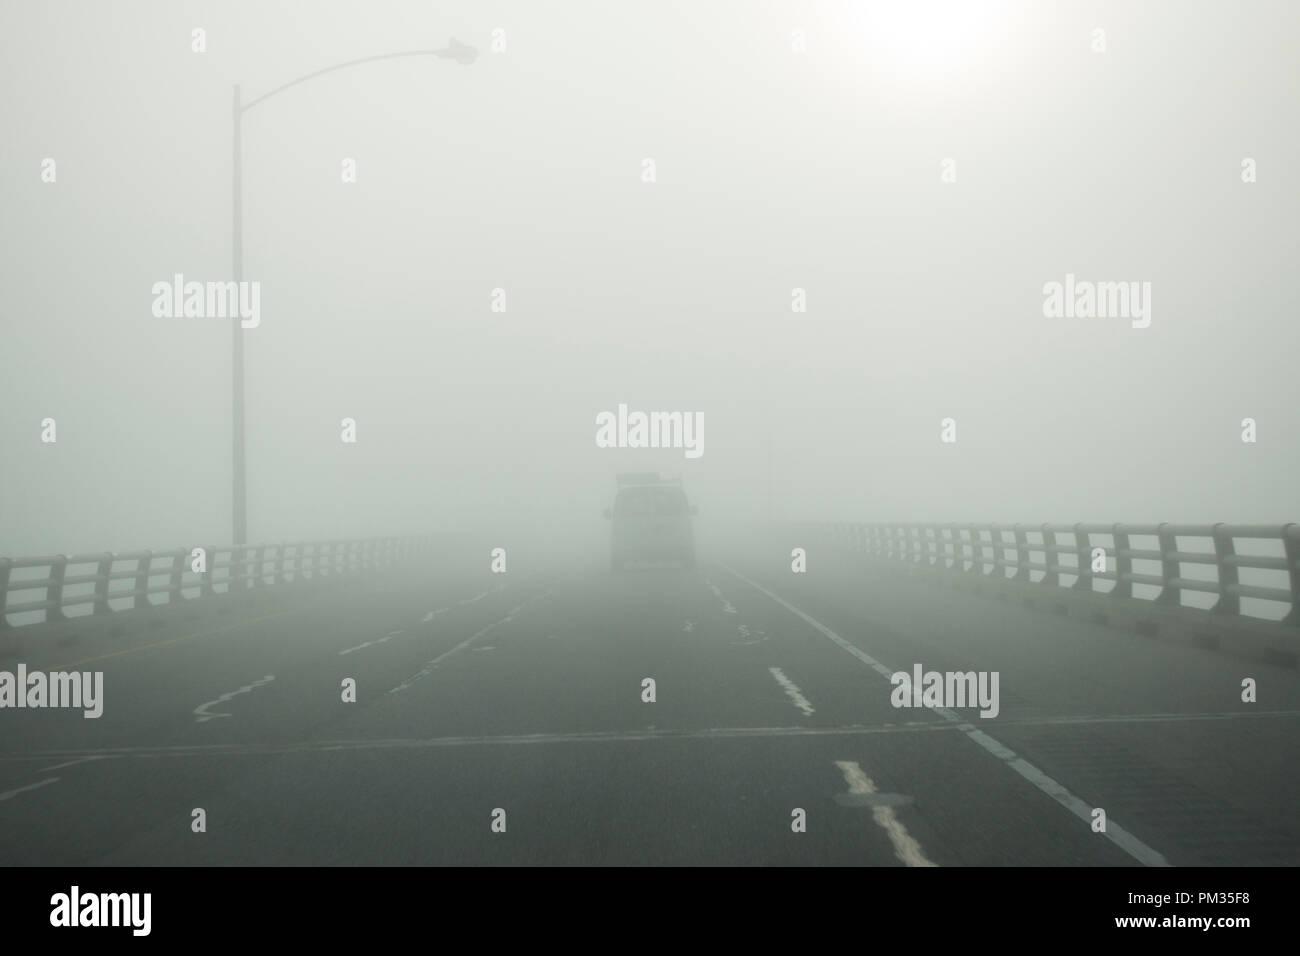 Traffic Highway Trestle Stock Photos & Traffic Highway